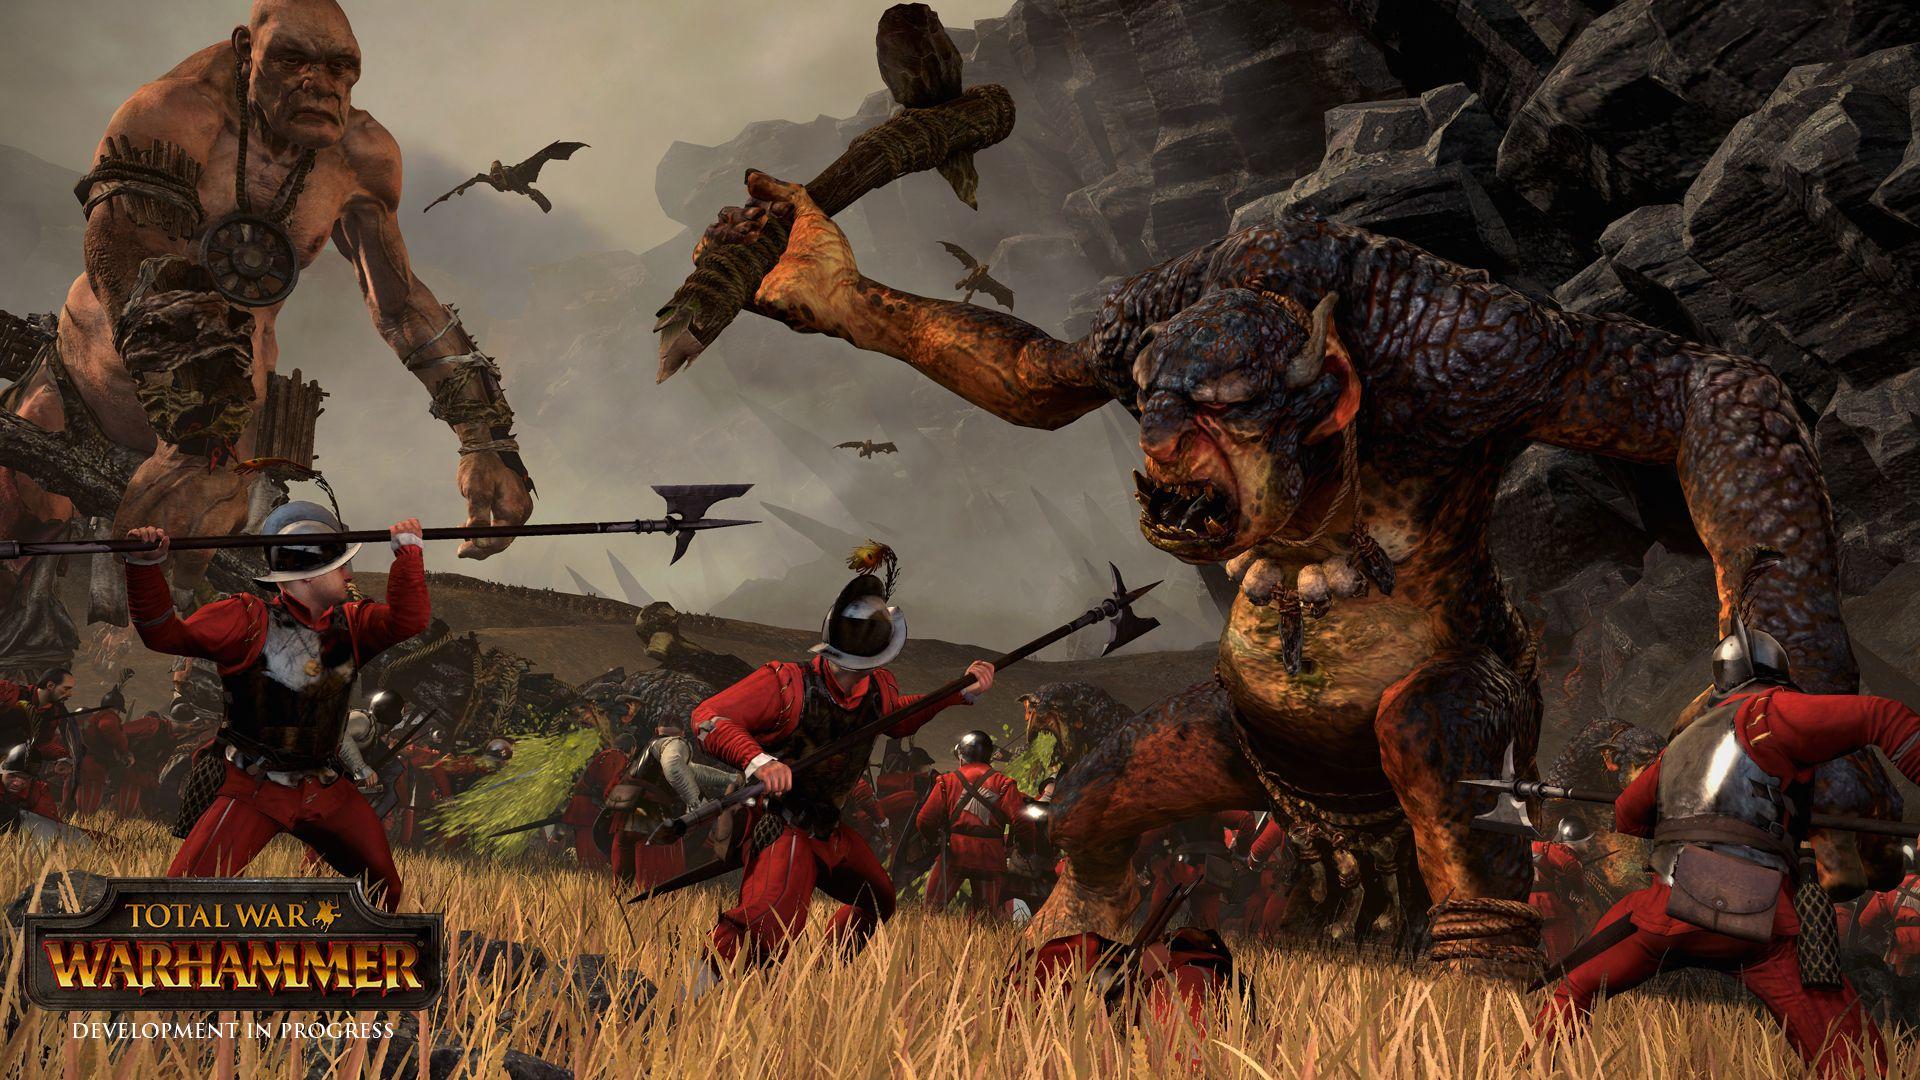 total_war_warhammer_screen_4